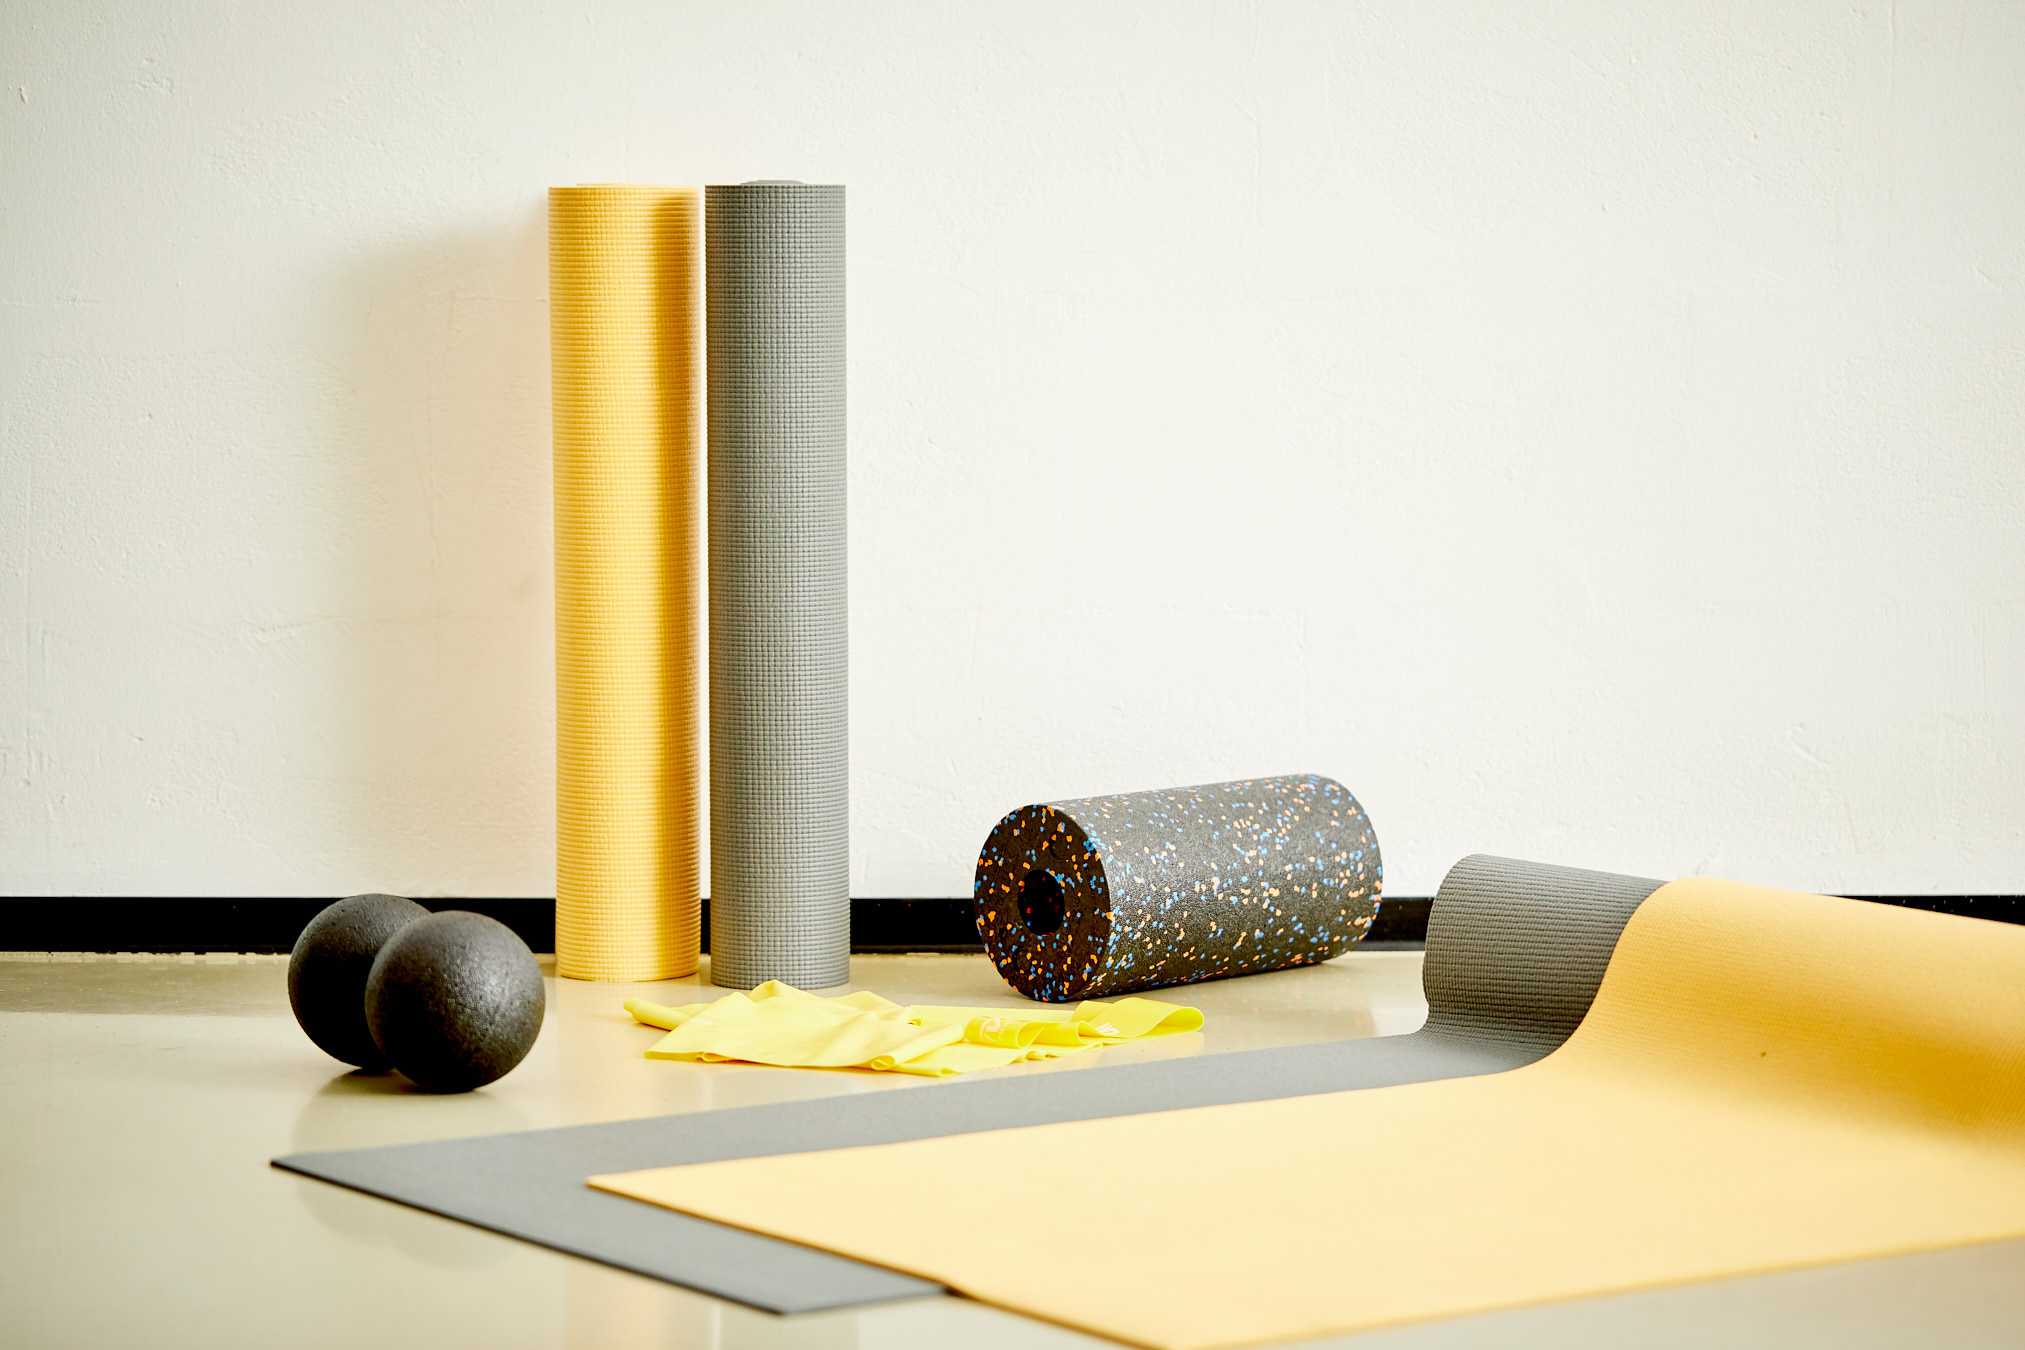 oliver robien matten gelb joern strojny